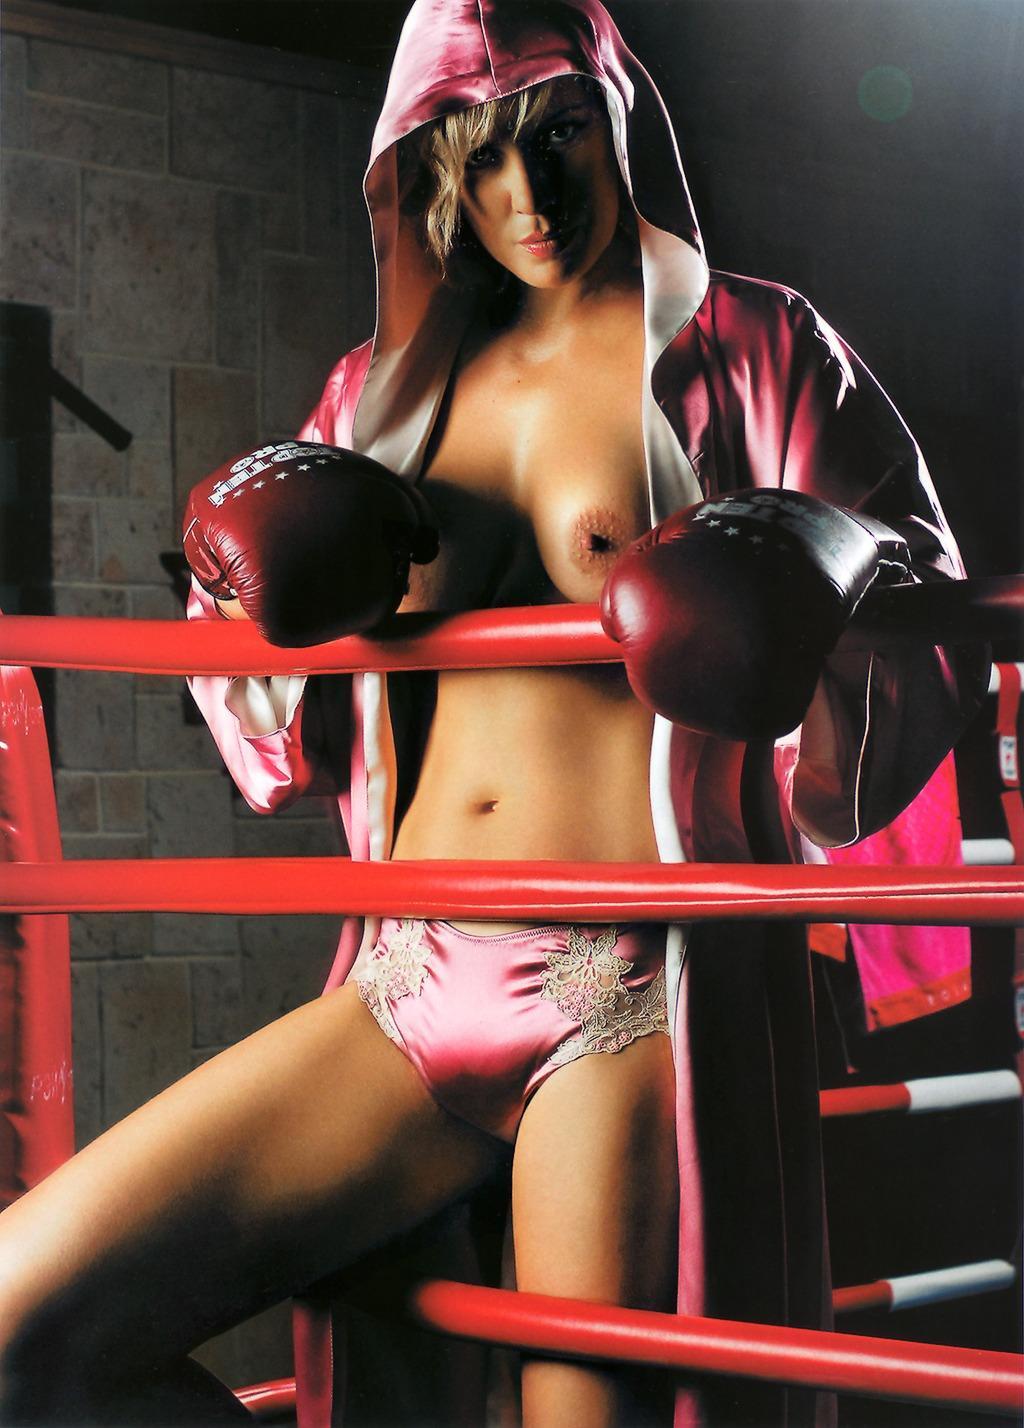 Групповушка видео девушки в боксе эро фото телепередач раздеваются программе